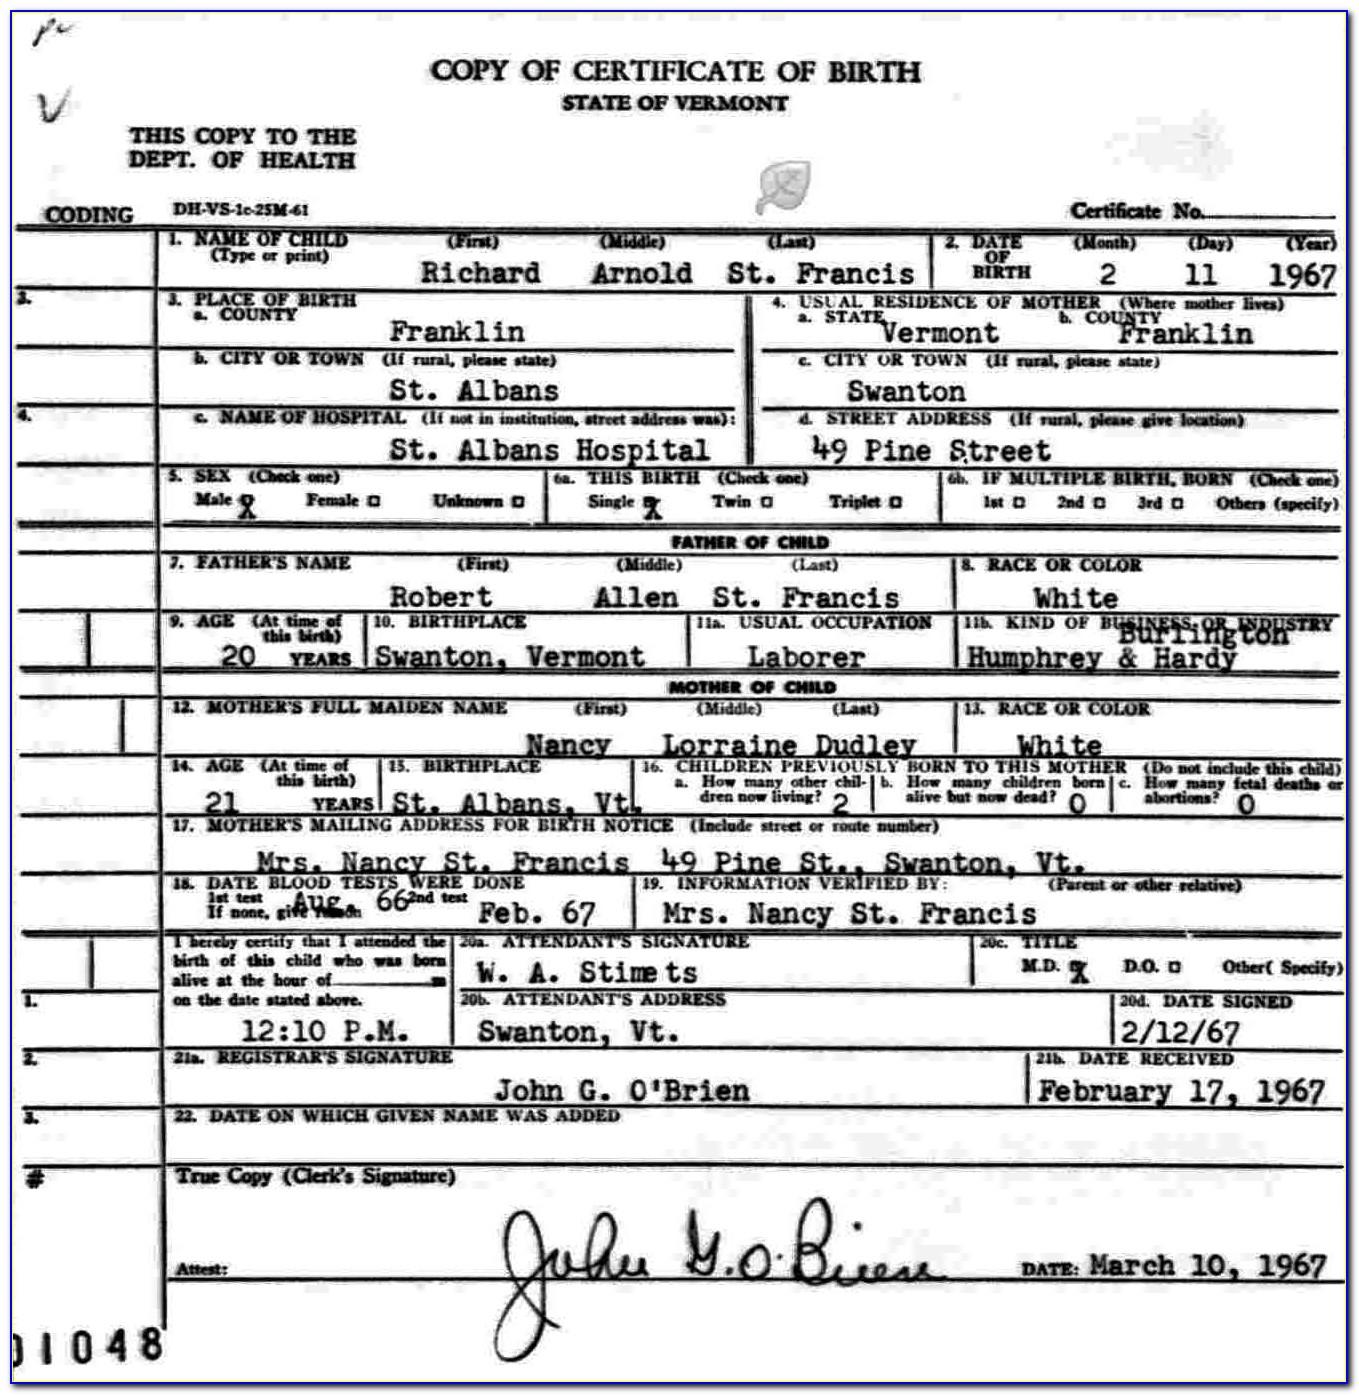 Cobb County Georgia Birth Certificate